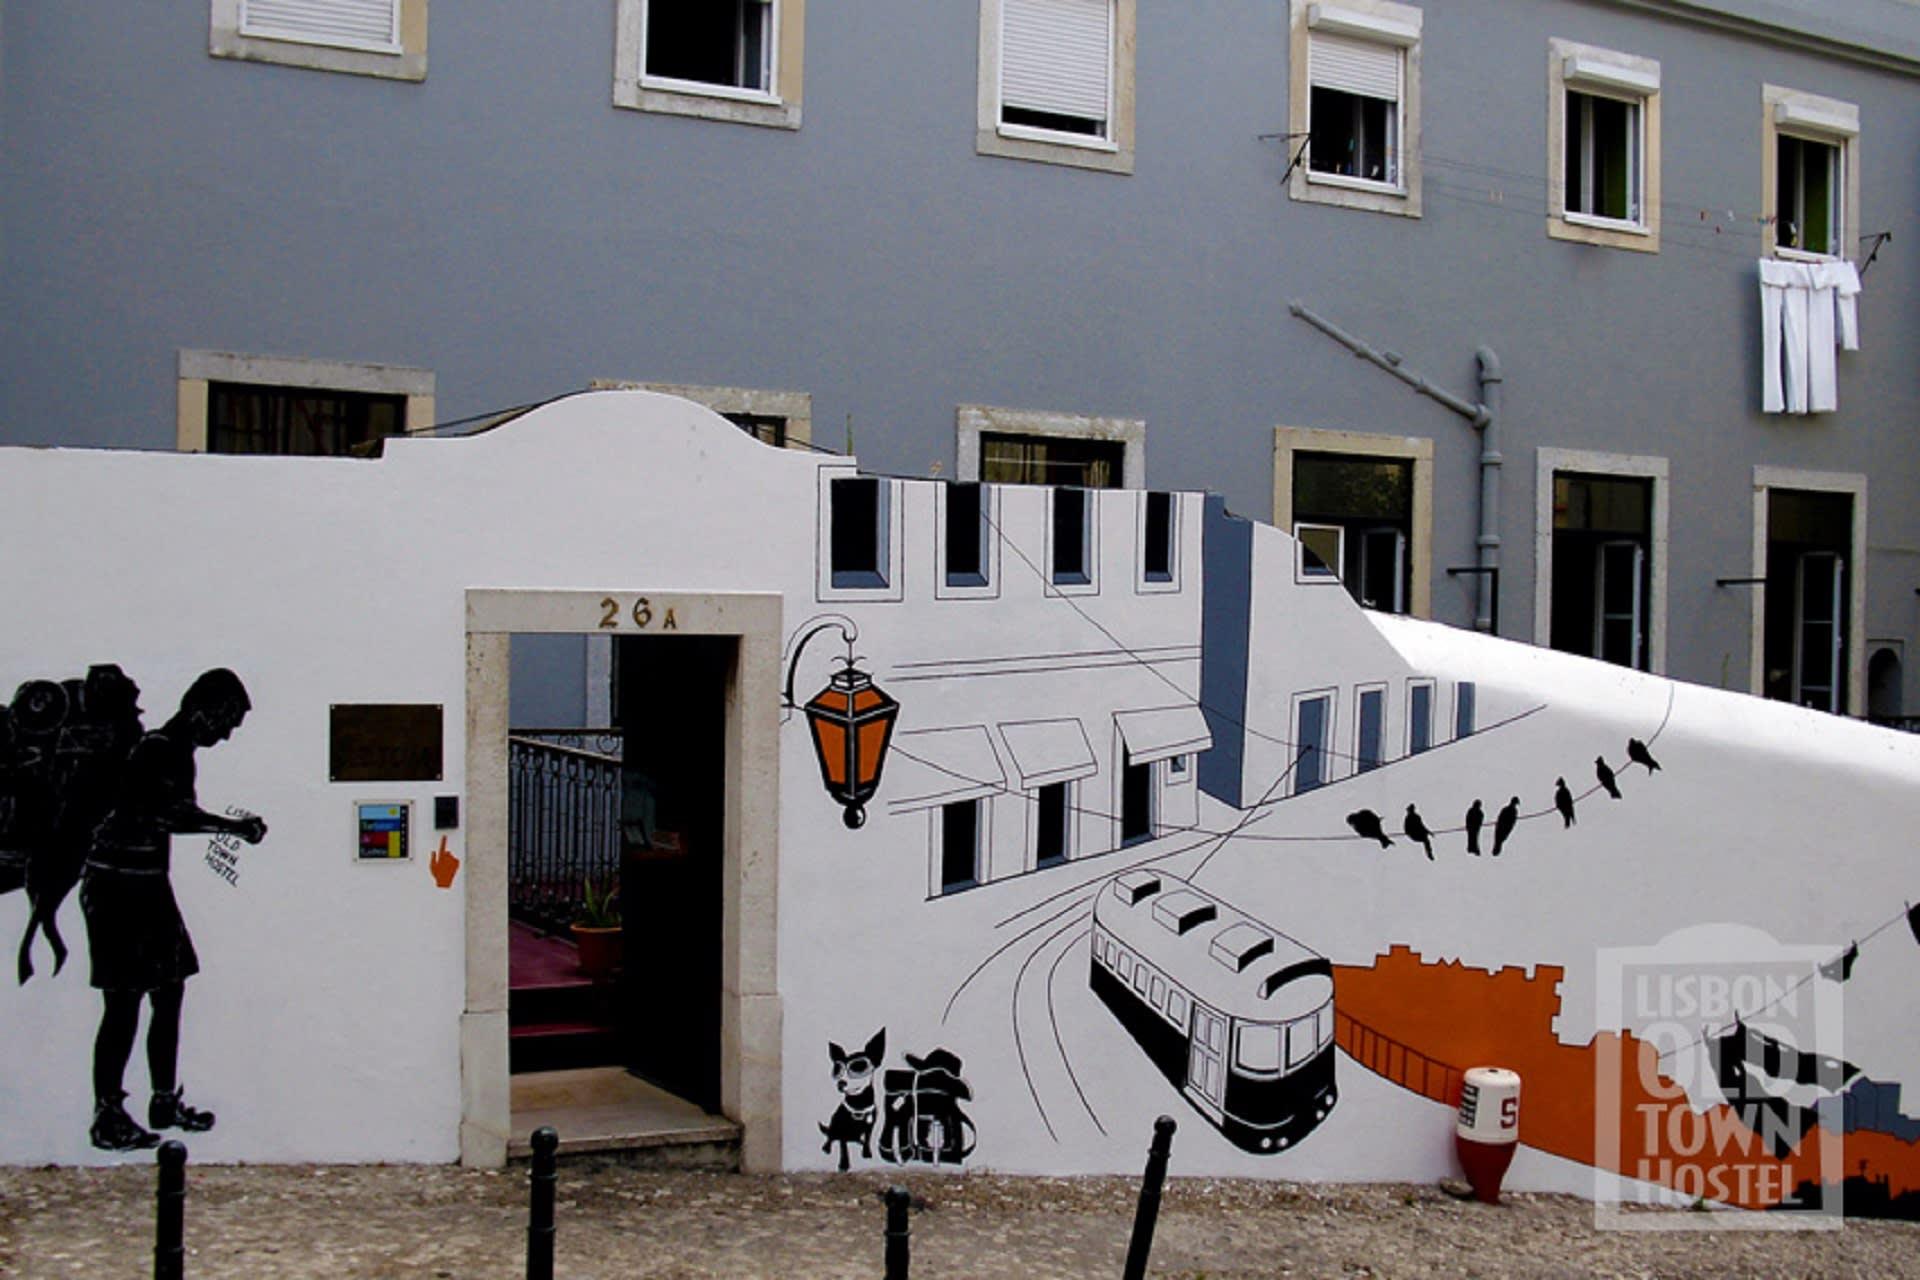 HOSTEL - Lisbon Old Town Hostel